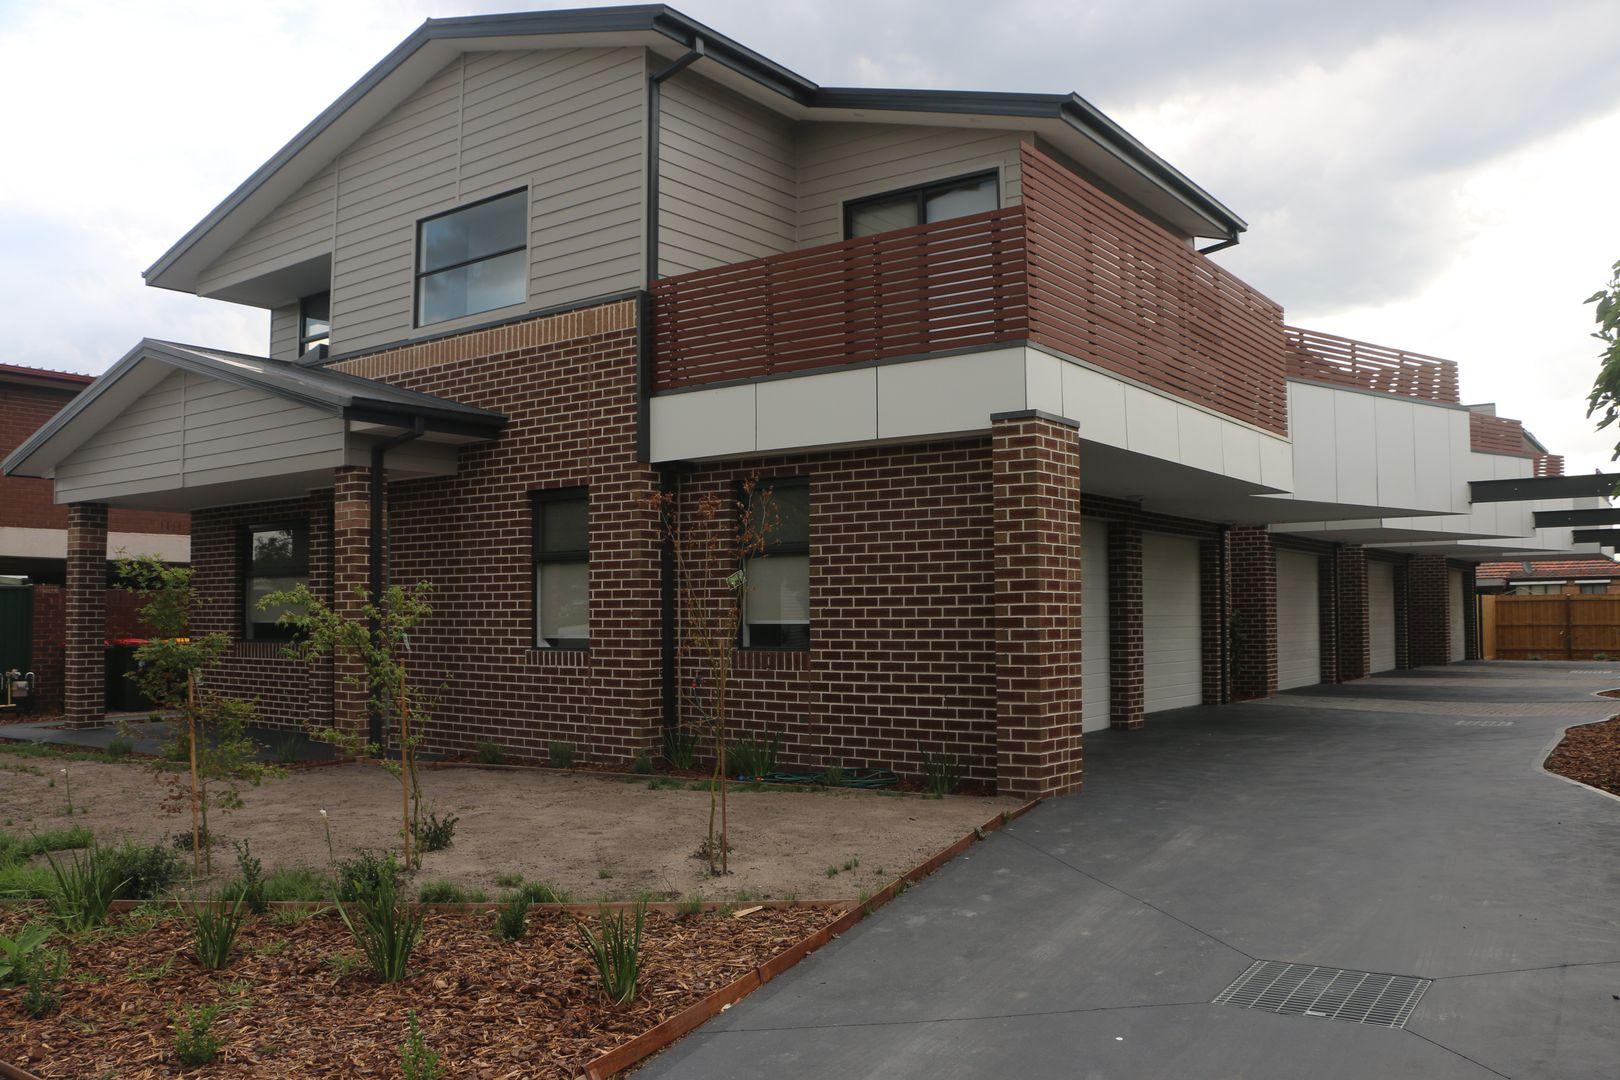 2/25 BRUCE STREET, Coburg VIC 3058, Image 0